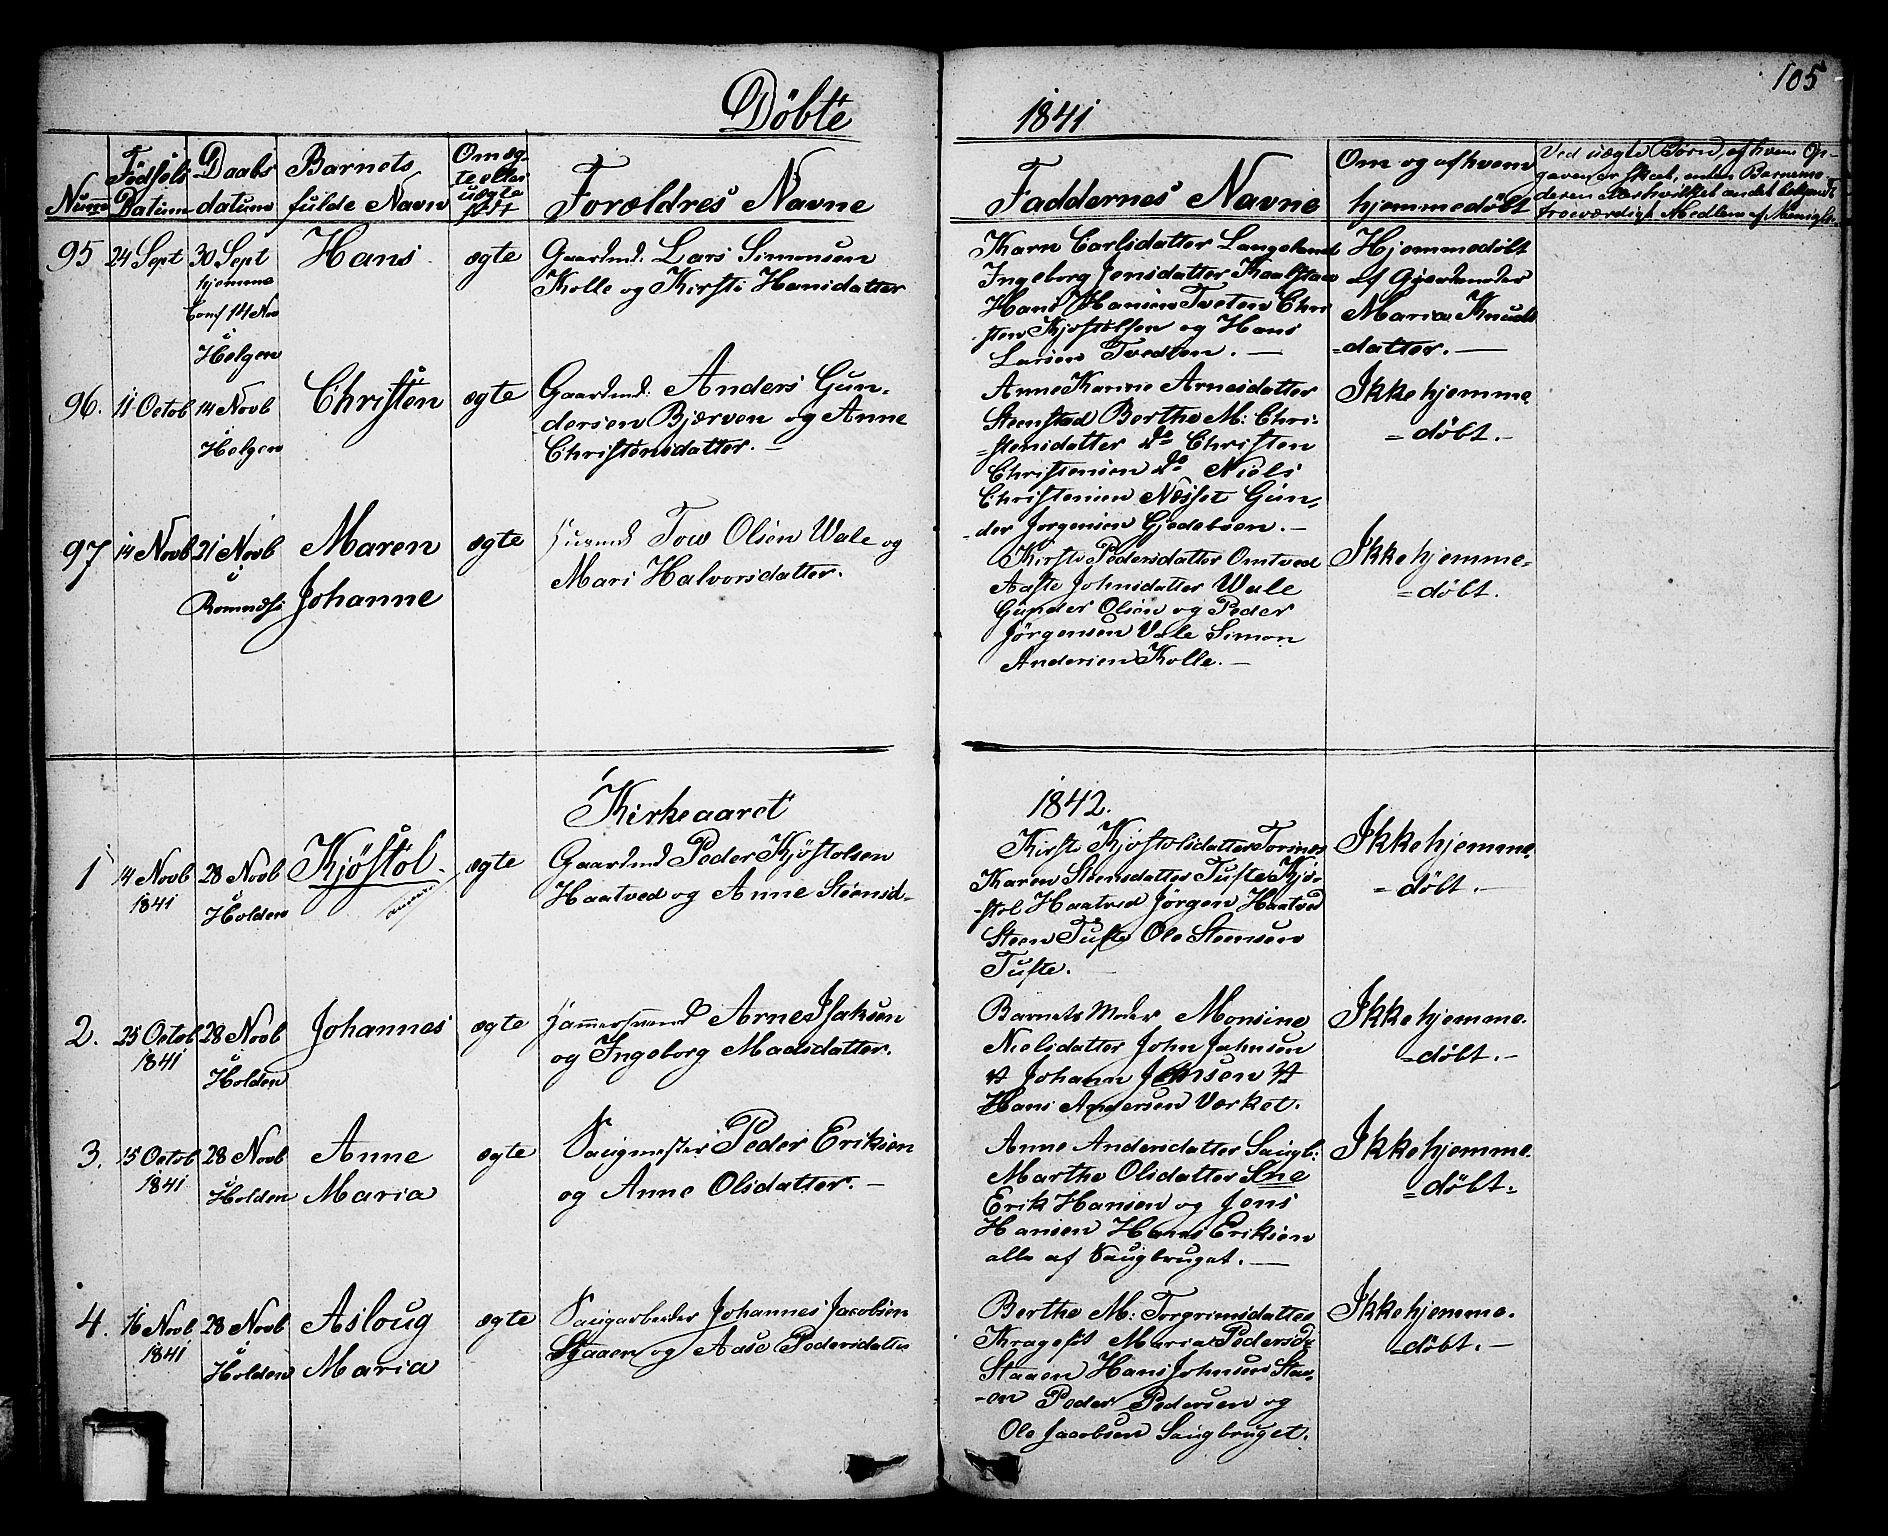 SAKO, Holla kirkebøker, F/Fa/L0004: Ministerialbok nr. 4, 1830-1848, s. 105